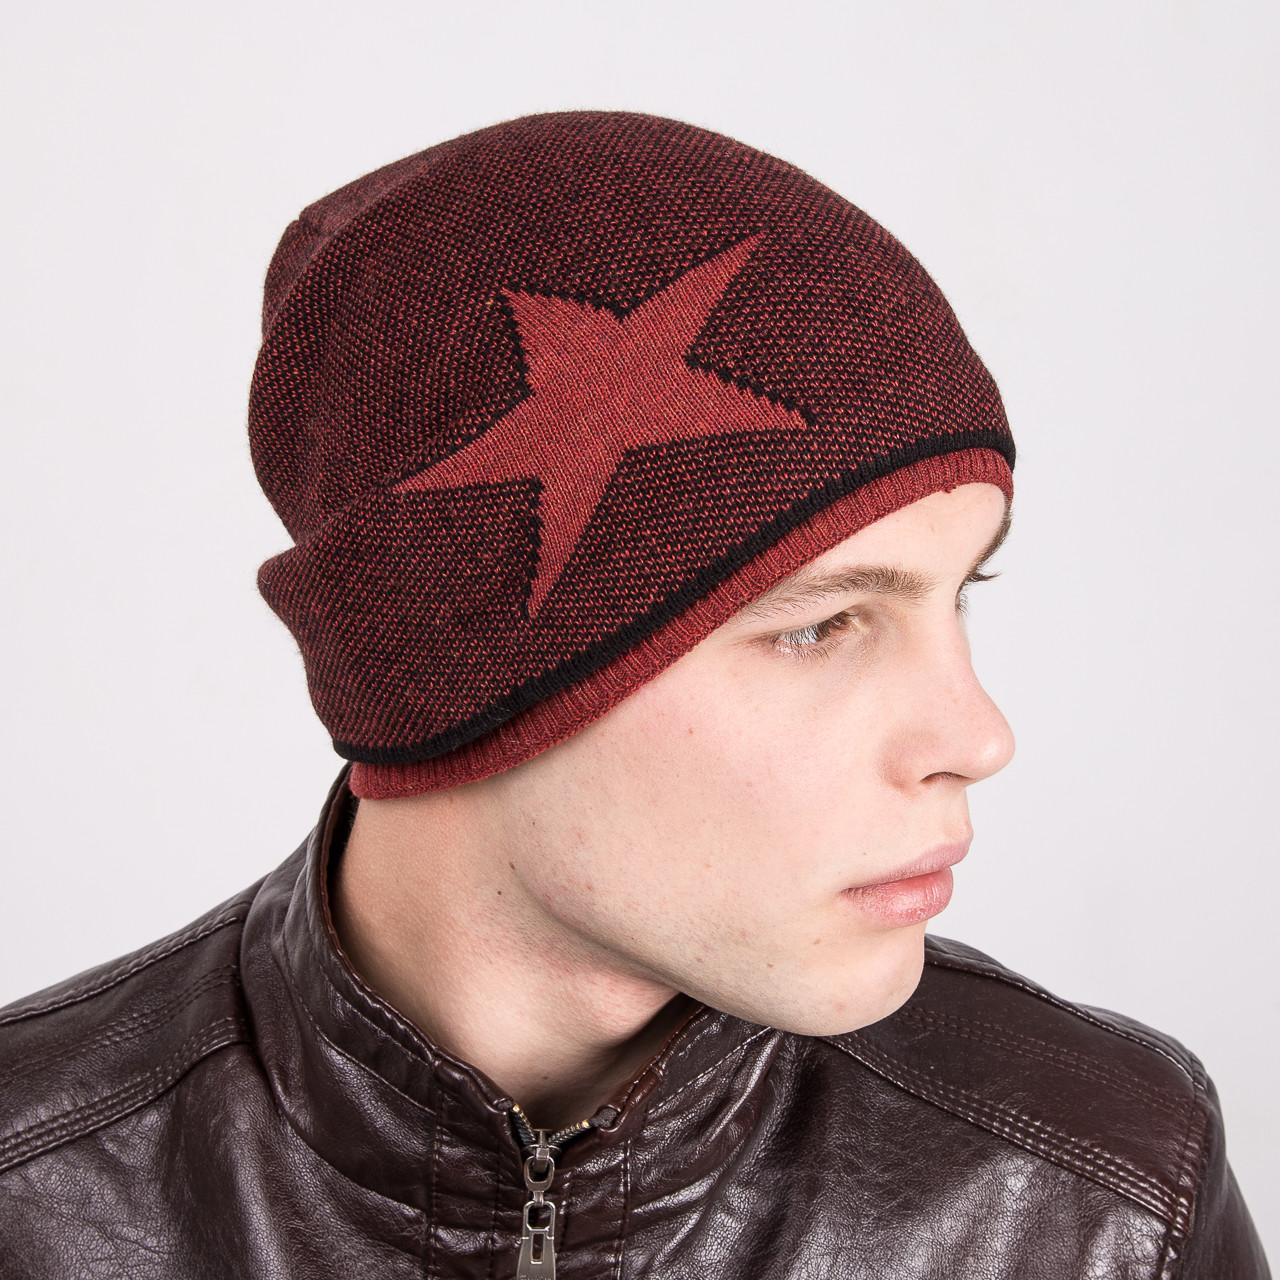 Мужская шапка колпак вязаная на флисе - Рок стар - Артикул m7b